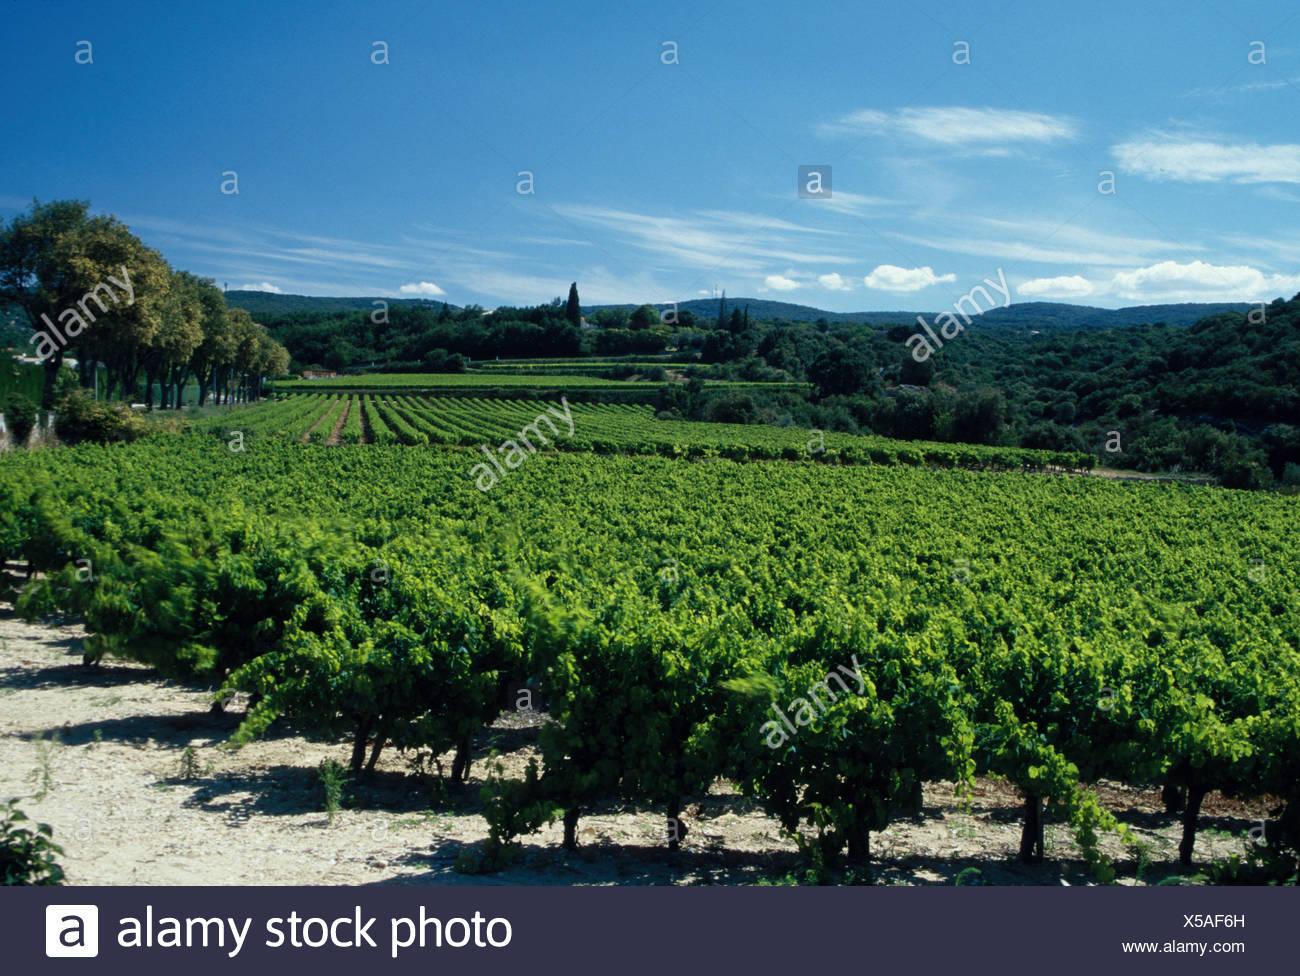 433eed47001893 Farming Vineyards Vineyard Ardeche region South France - Stock Image